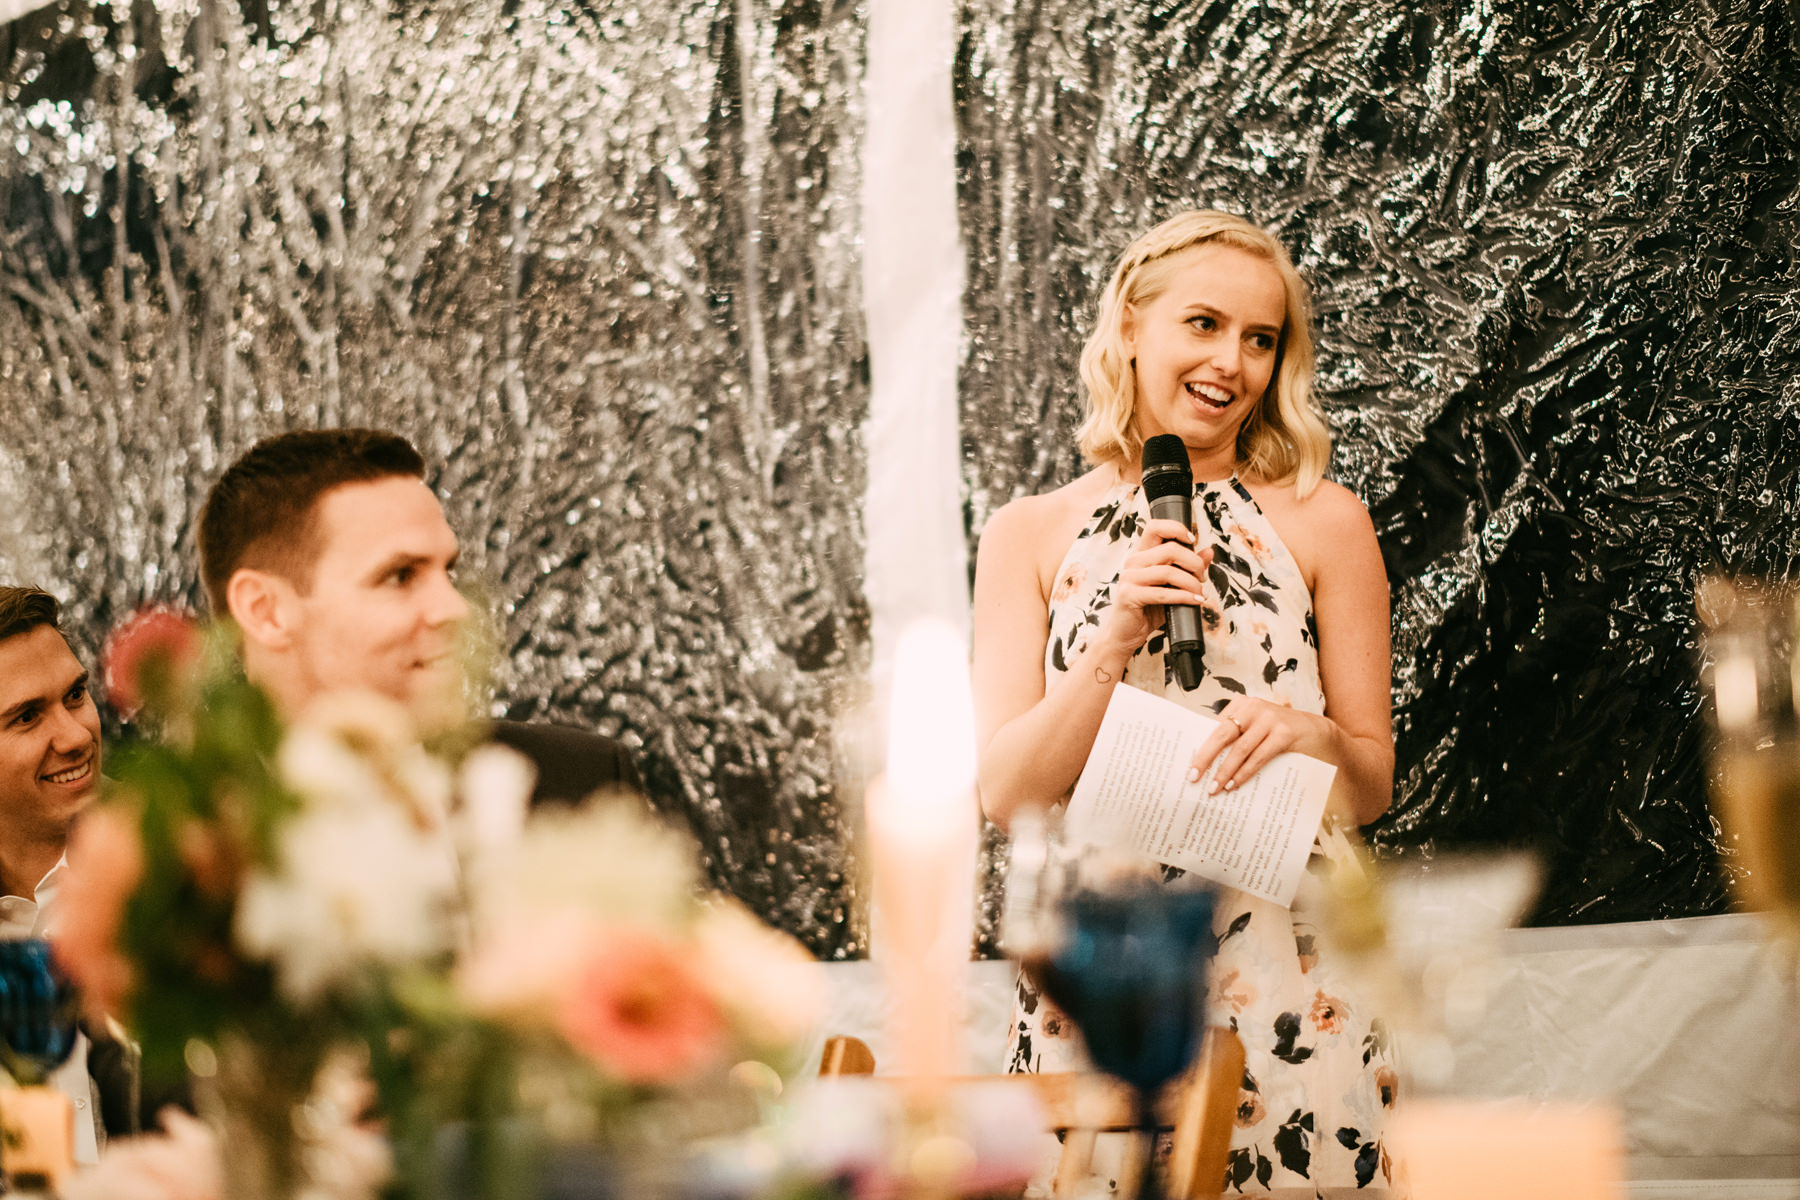 383-colorful-outdoor-lopez-island-wedding.jpg